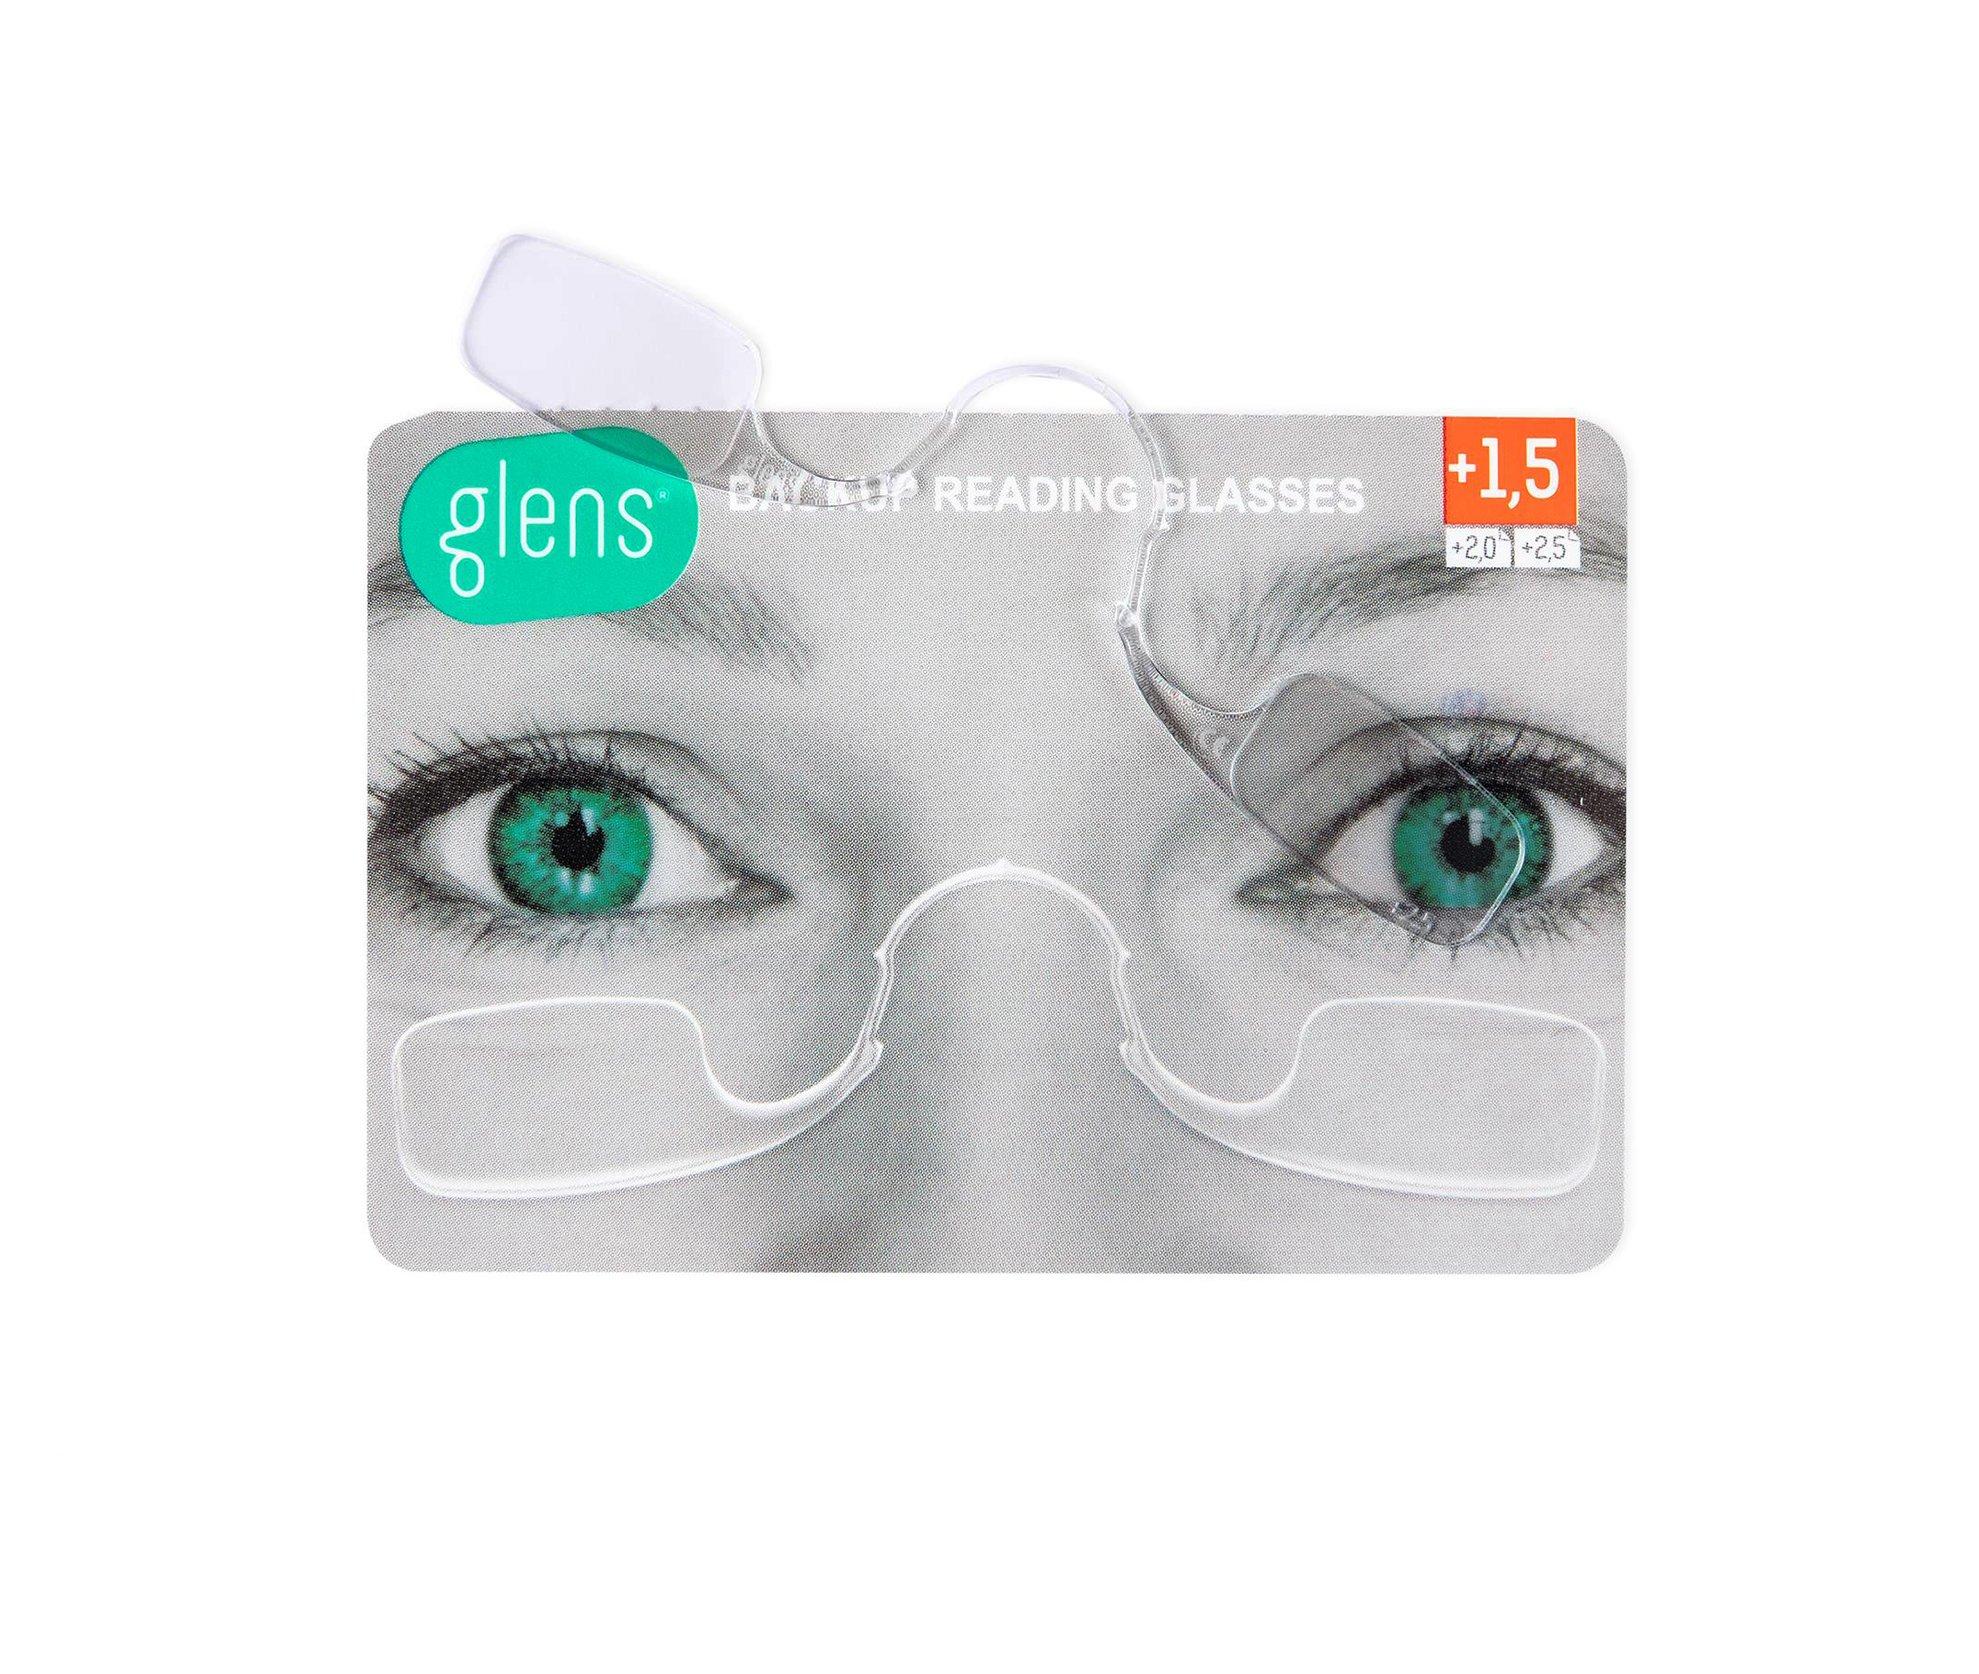 bba9d6f2aa15 Amazon.com  Glens Backup Reading Glasses Correction Strength (+1.5 ...